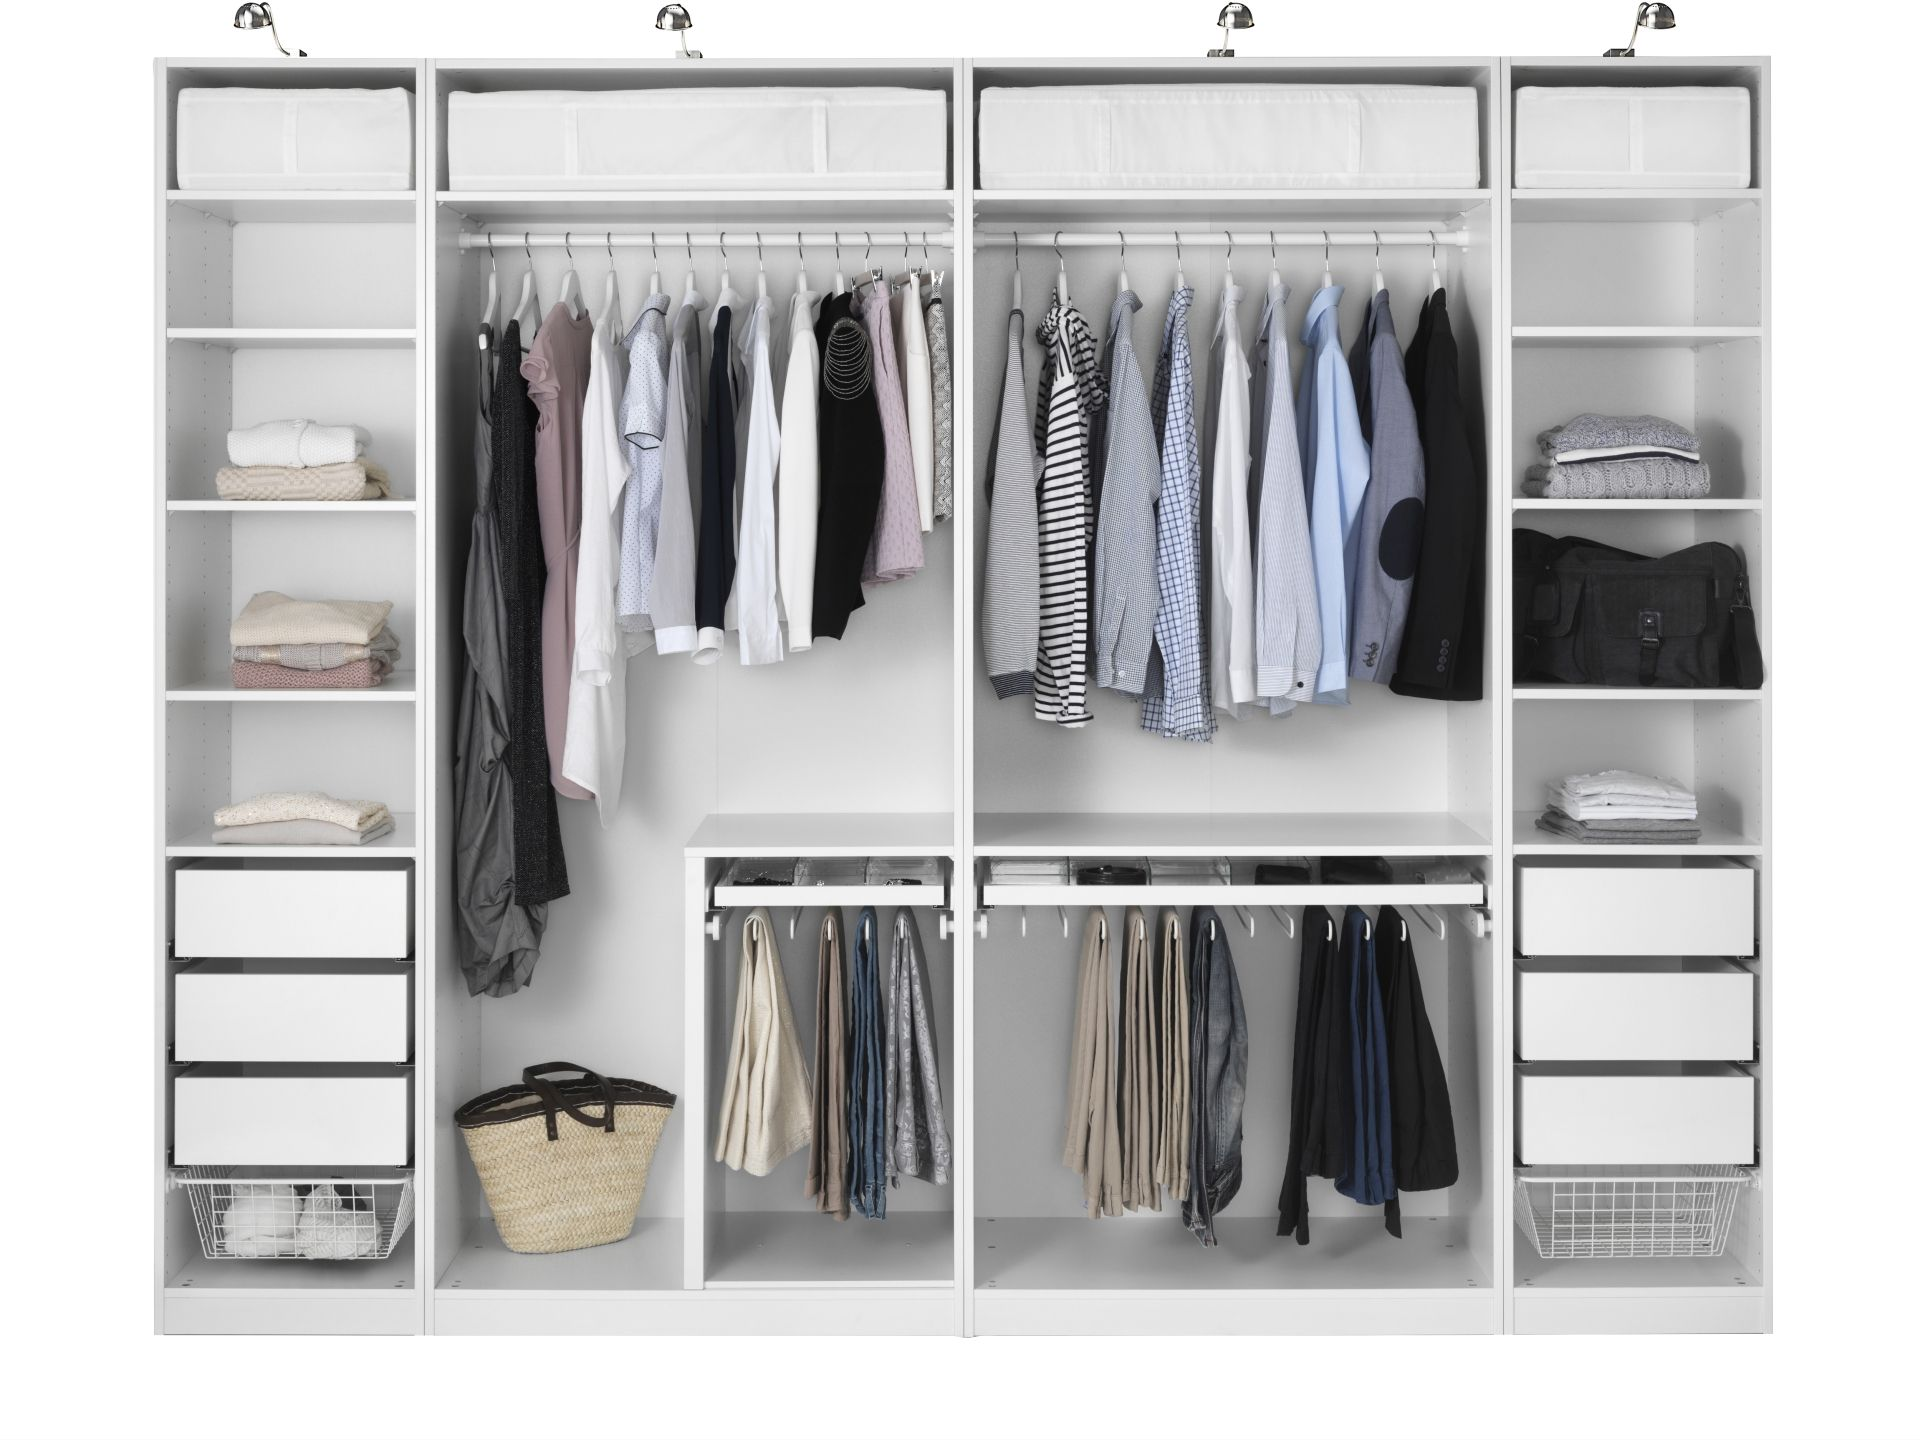 Pax Kledingkastsysteem Ikea Catalogus 2018 In 2019